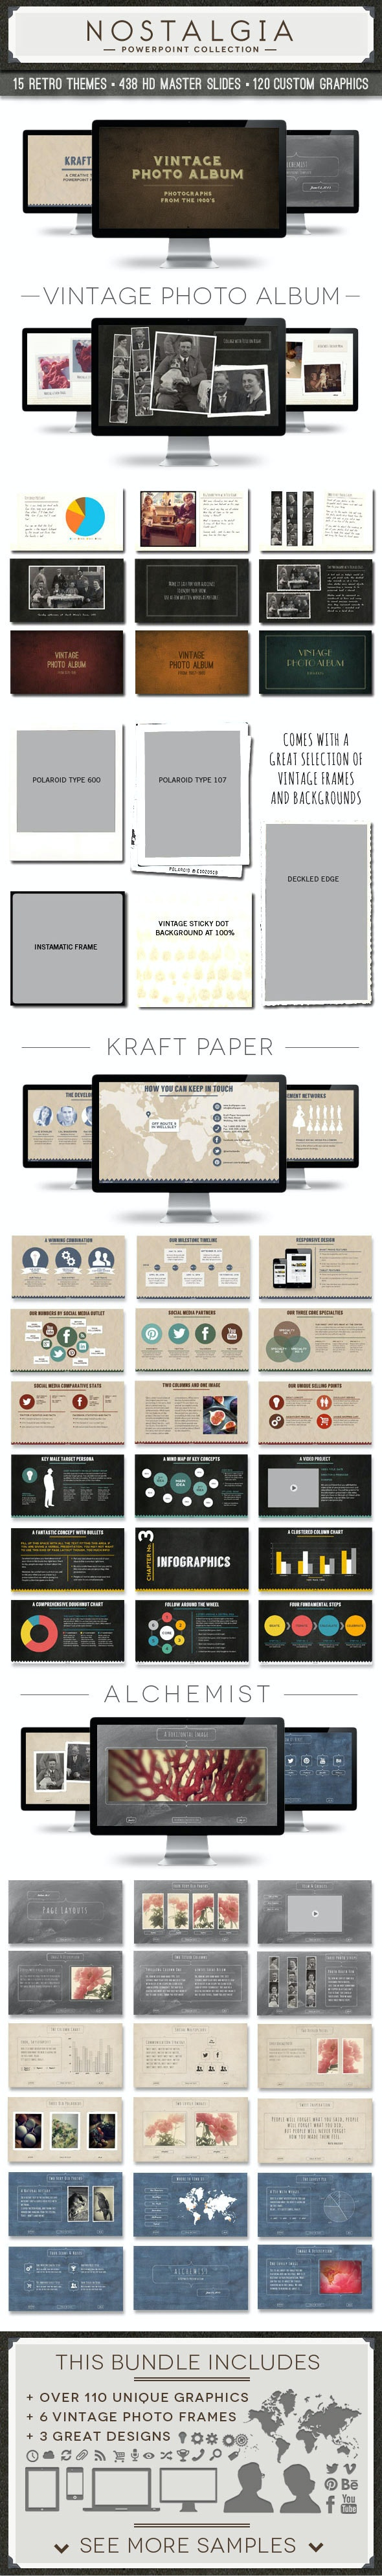 Nostalgia Collection Powerpoint Template Bundle - Creative PowerPoint Templates